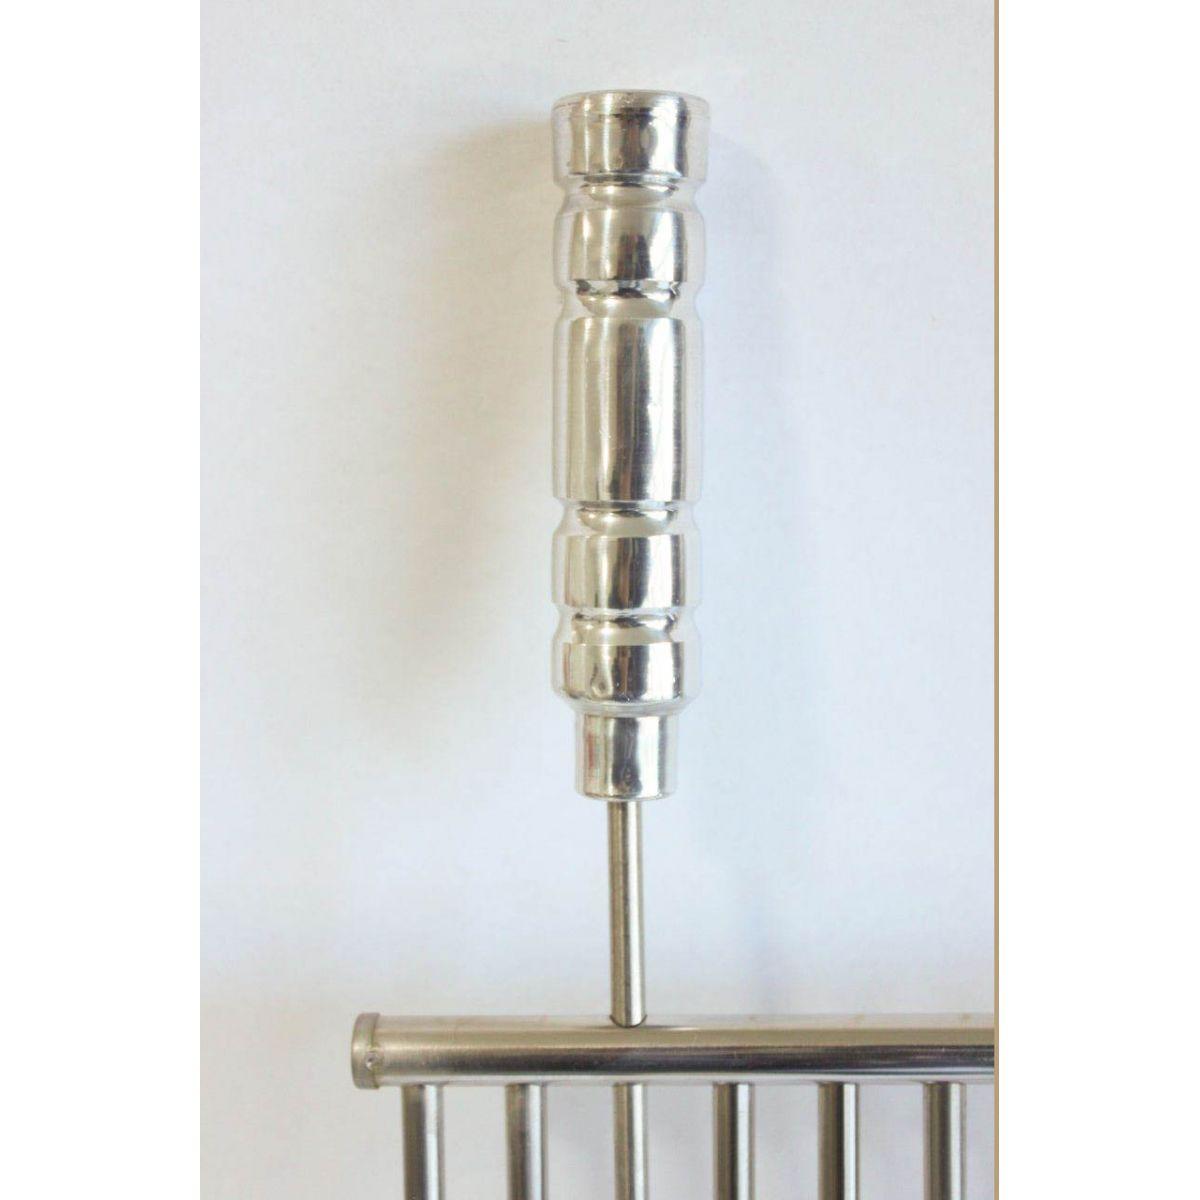 Grelha Tubular de Inox - 50cm x 50cm